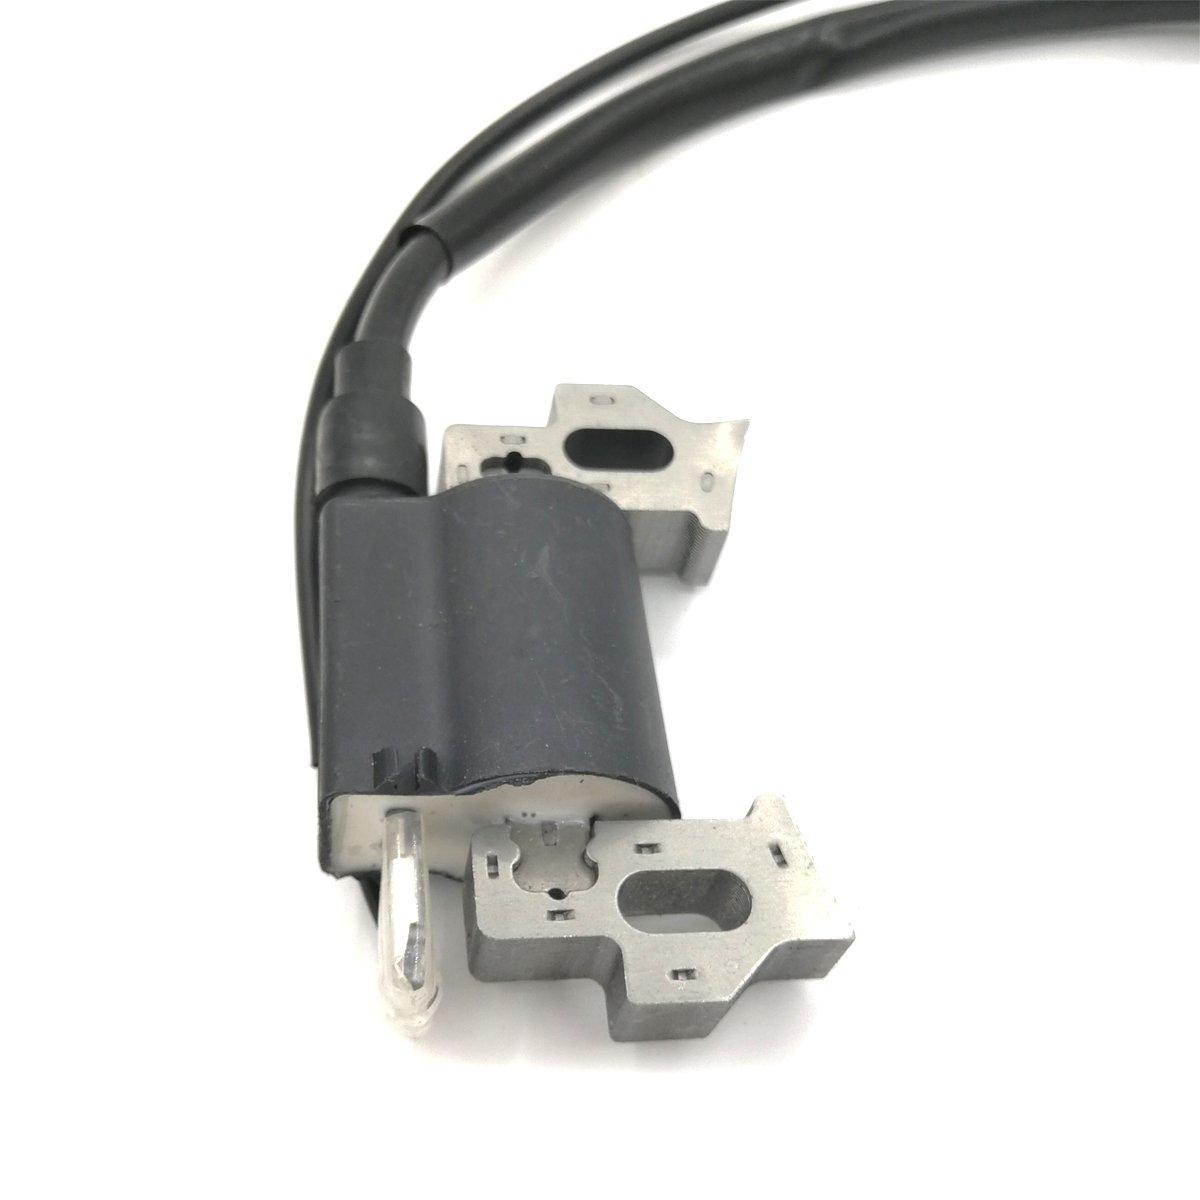 Shioshen Z/ündung Spule Magneto Modul W//Spark Plug GAP Boot f/ür HONDA GX100 GX120 GX160 GX200 5,5HP 6.5hp Motor